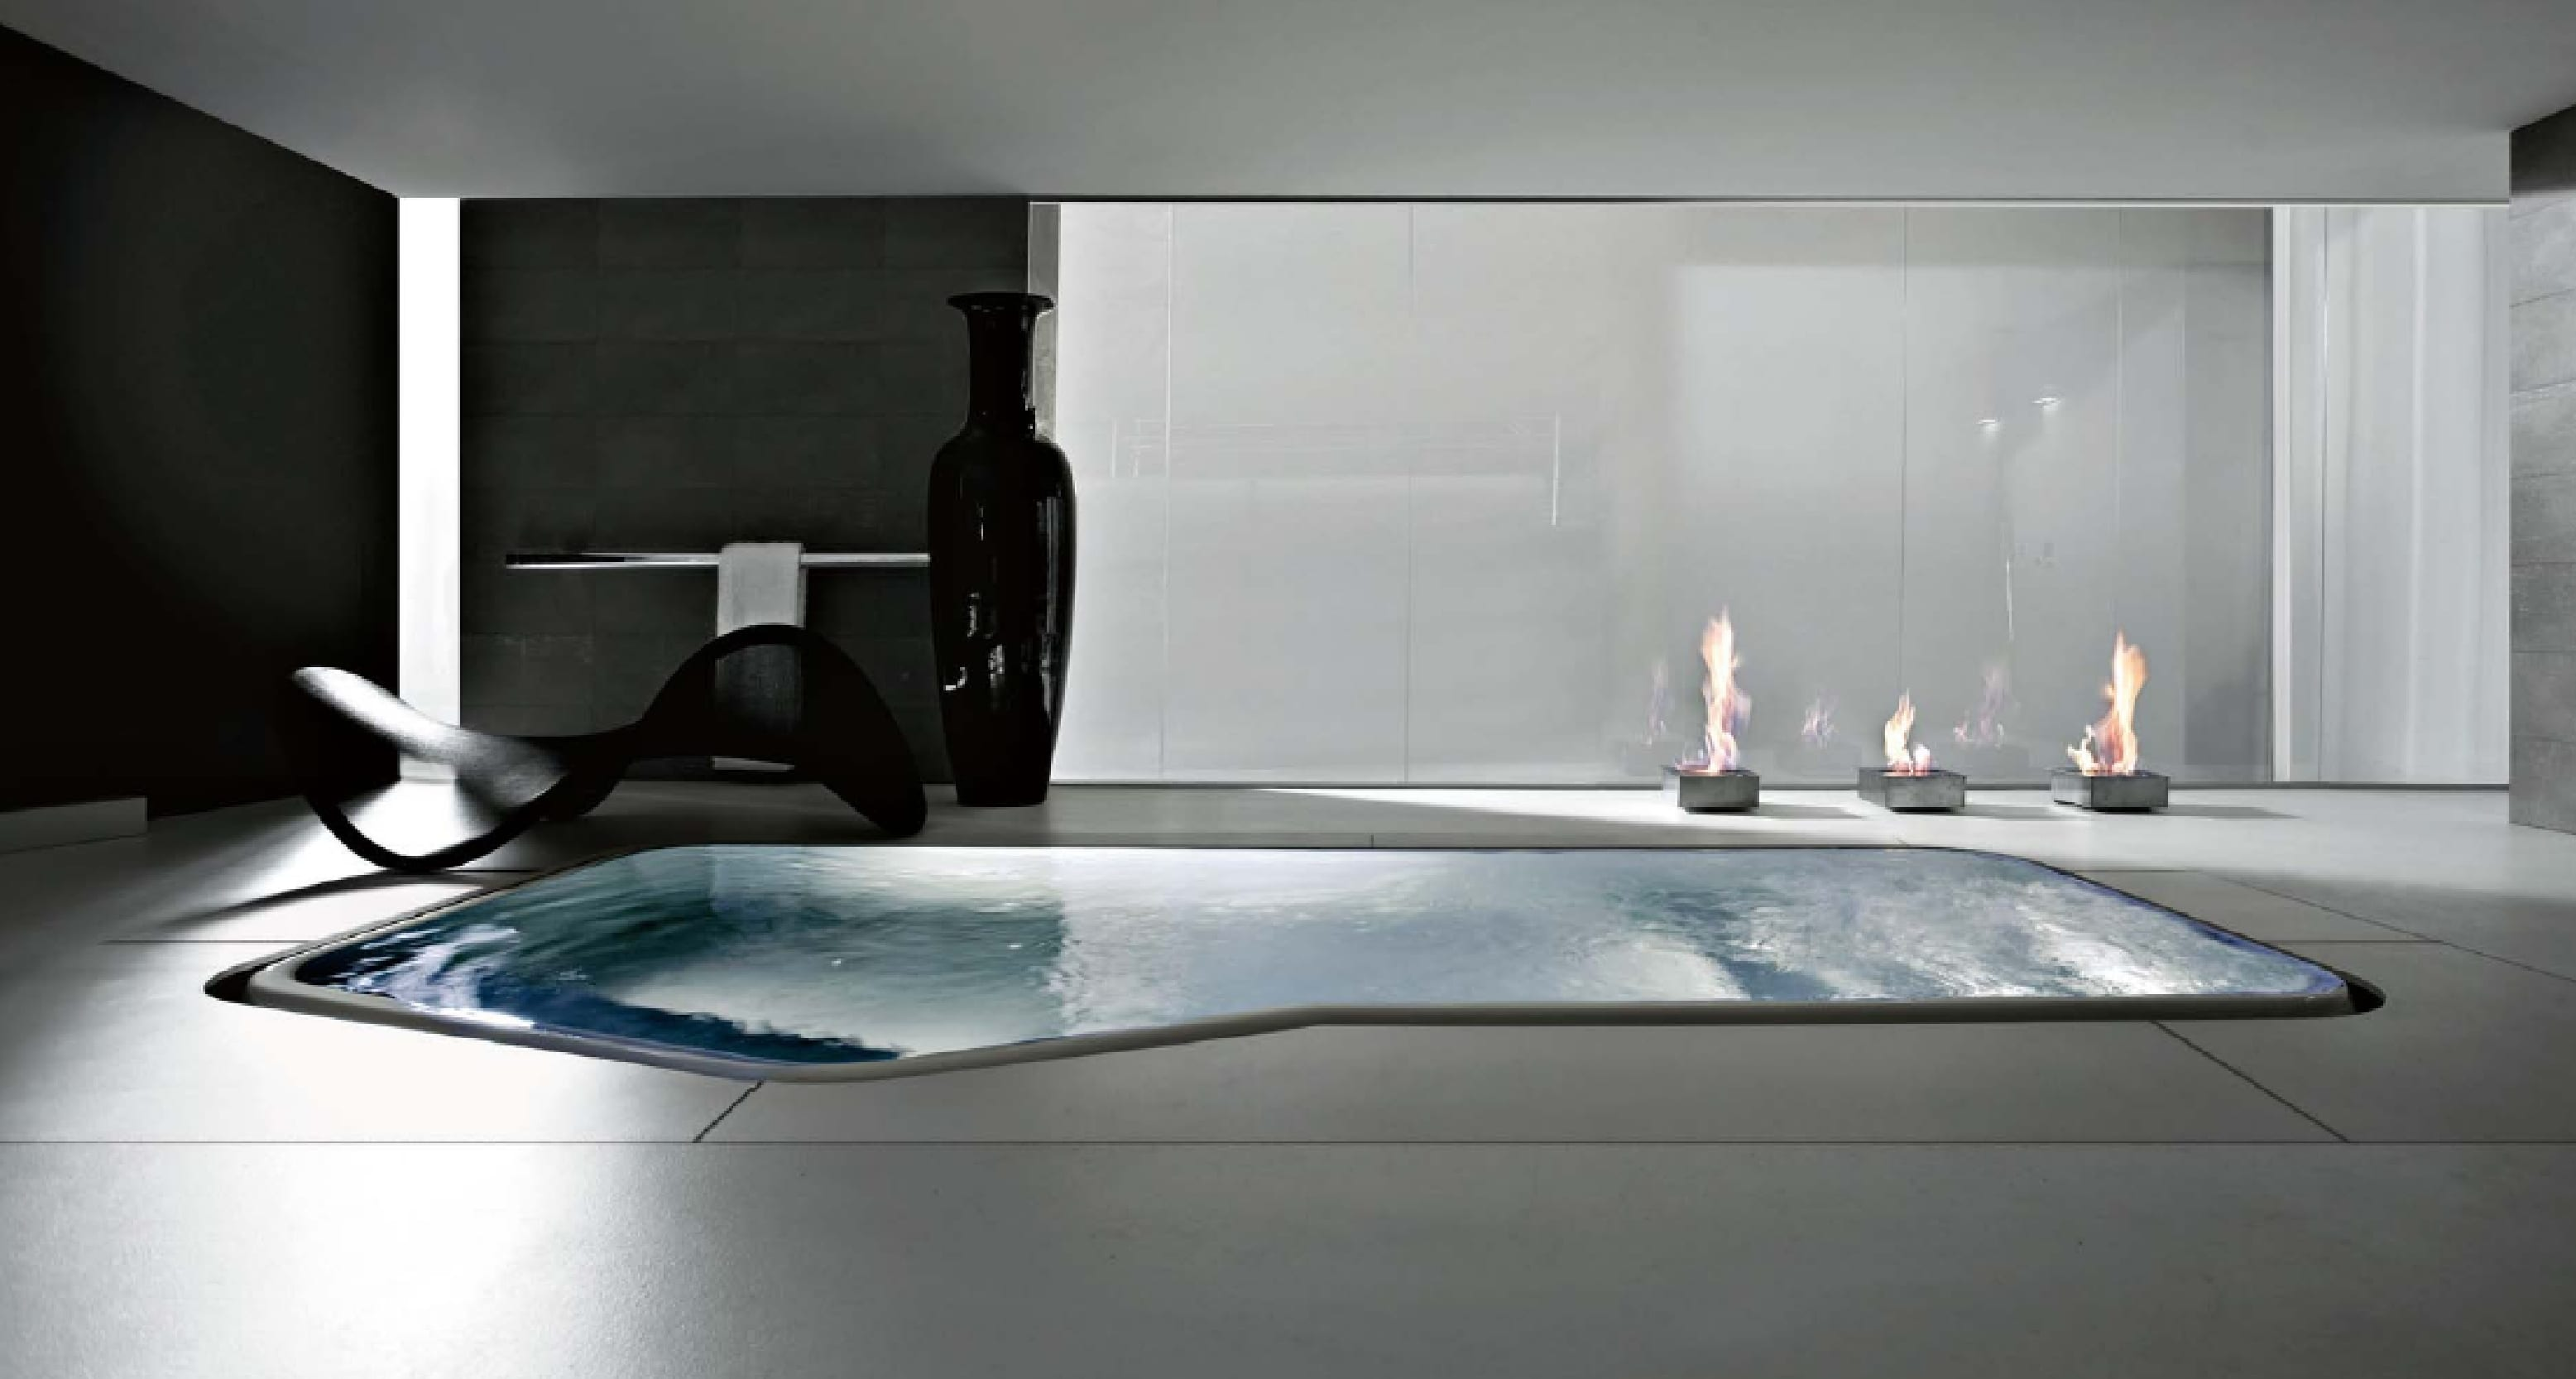 whirlpool badewanne - innenpool- luxus badezimmer